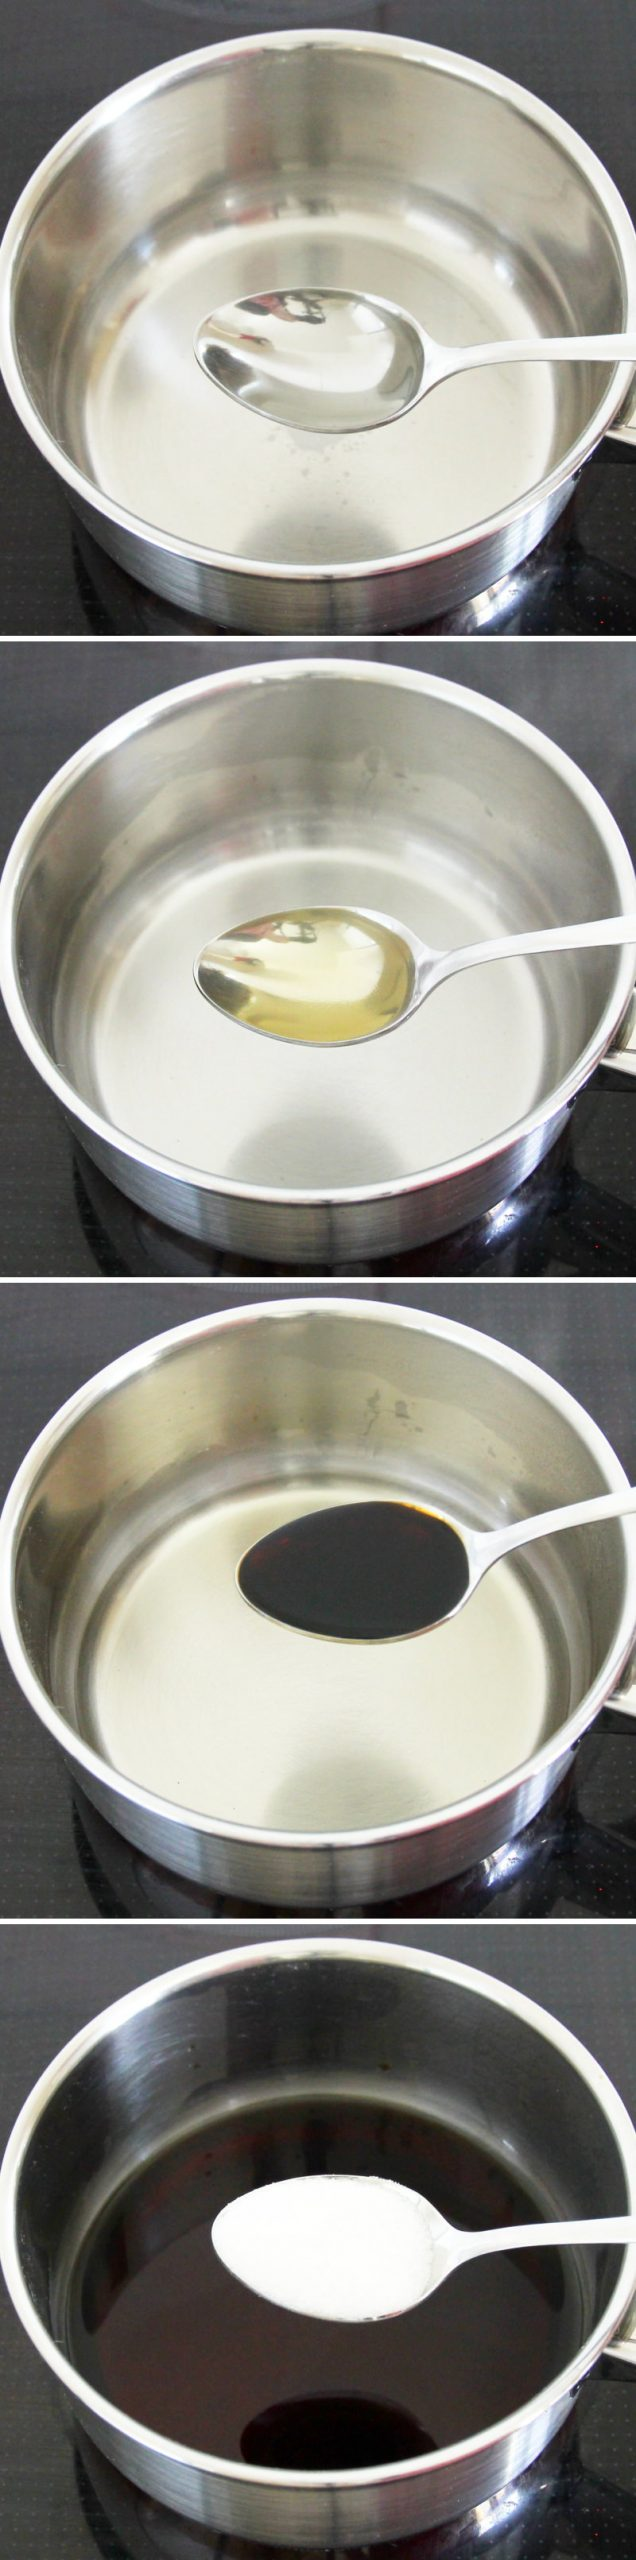 Teriyaki Sauce Schritt 2 Zutaten vermischen